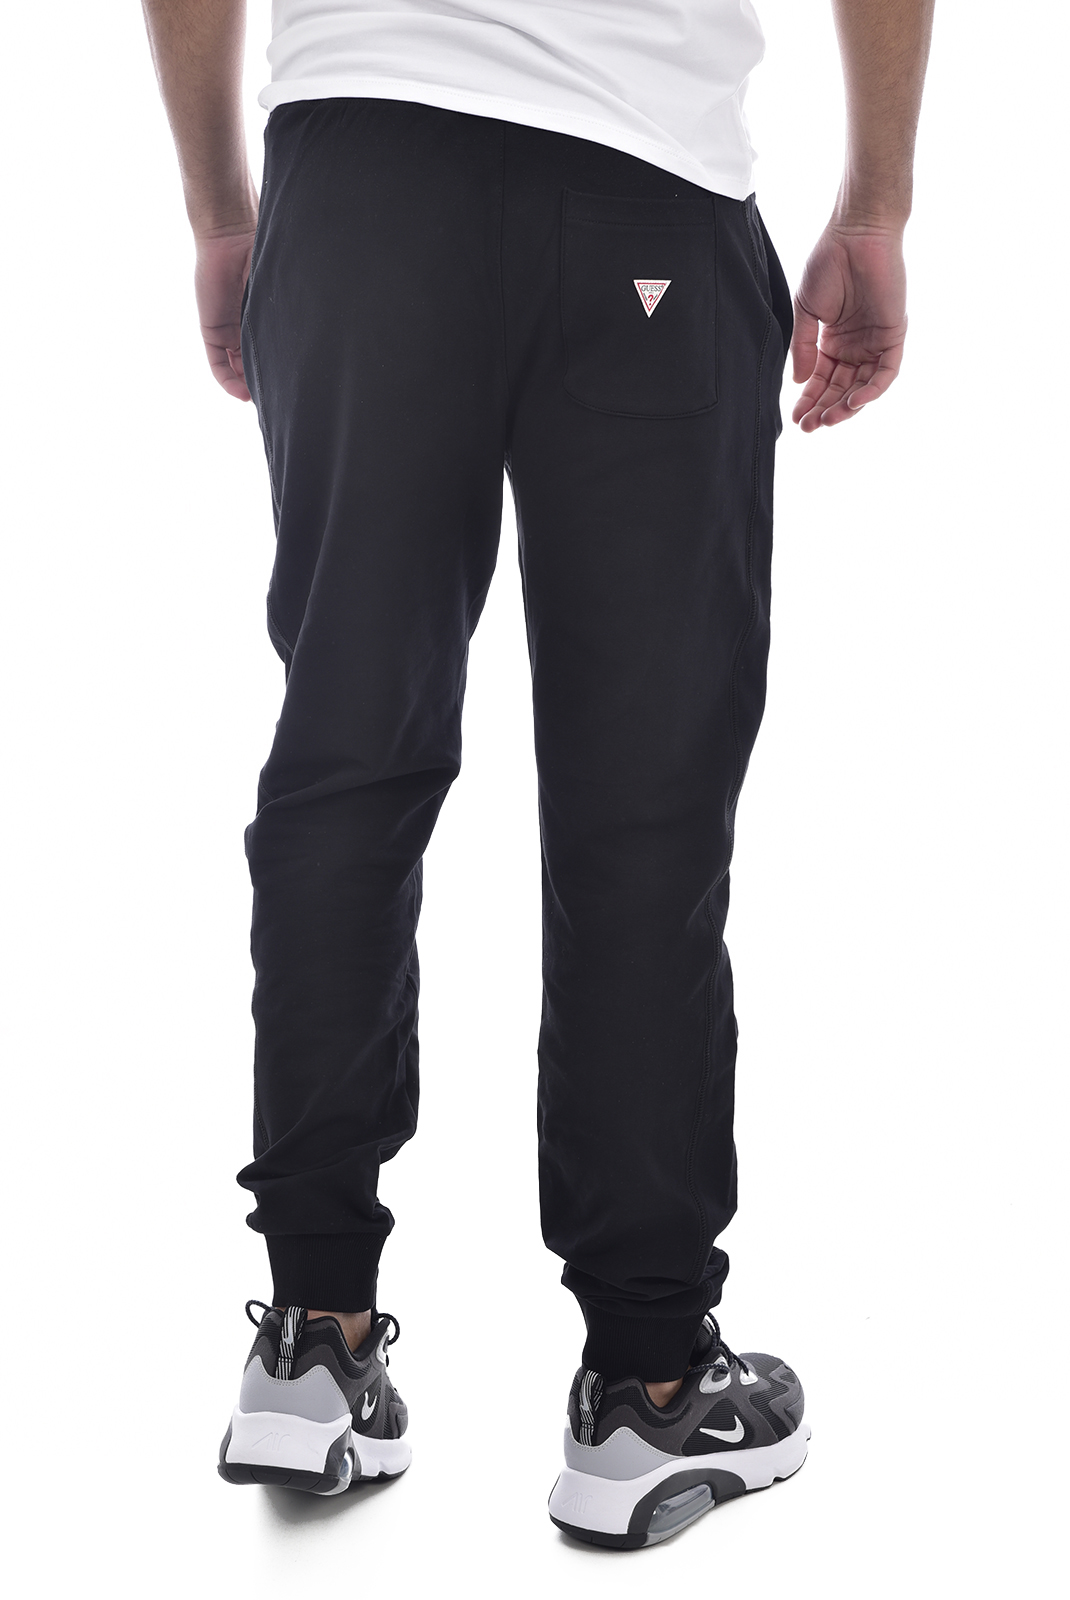 Pantalons sport/streetwear  Guess jeans M02B37 K6ZS0 ADAM JBLKJ et Black A996